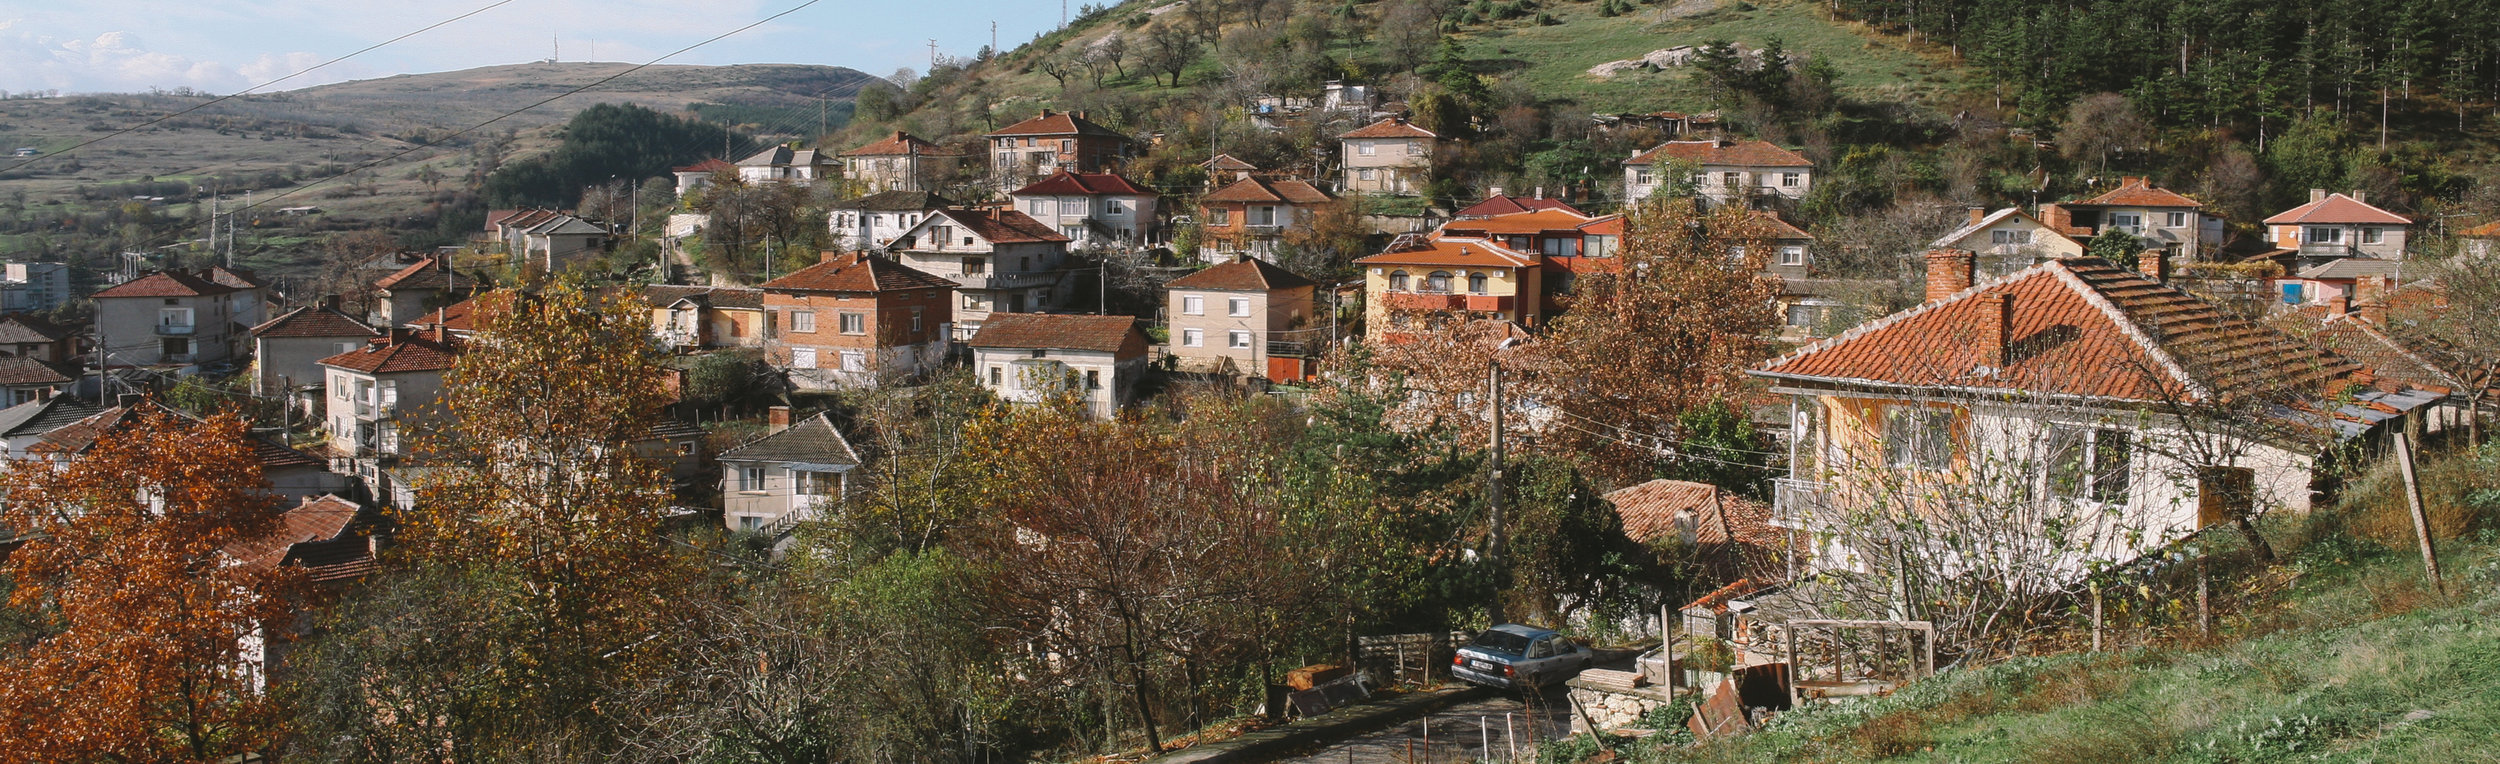 A panoramic view of the old neighborhood of Ortakio.